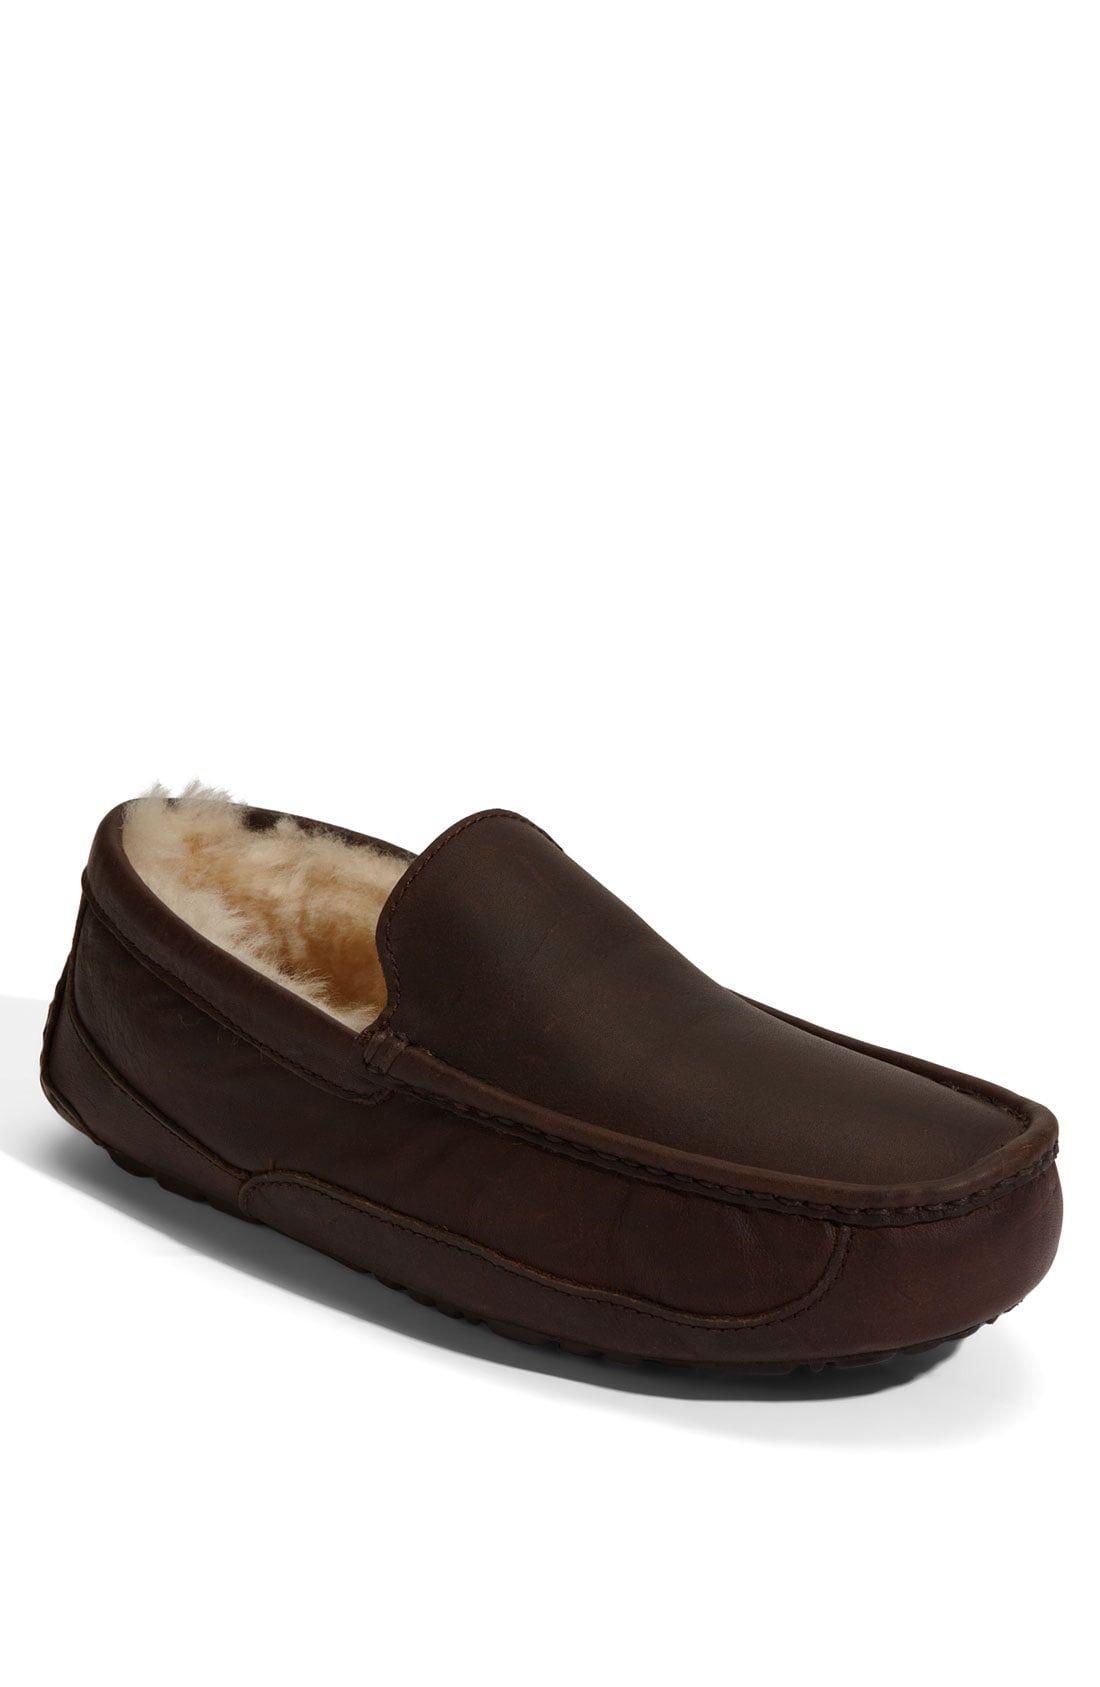 ac873149549 UGG UGG ASCOT LEATHER SLIPPER. #ugg #shoes #flats | Ugg in 2019 ...